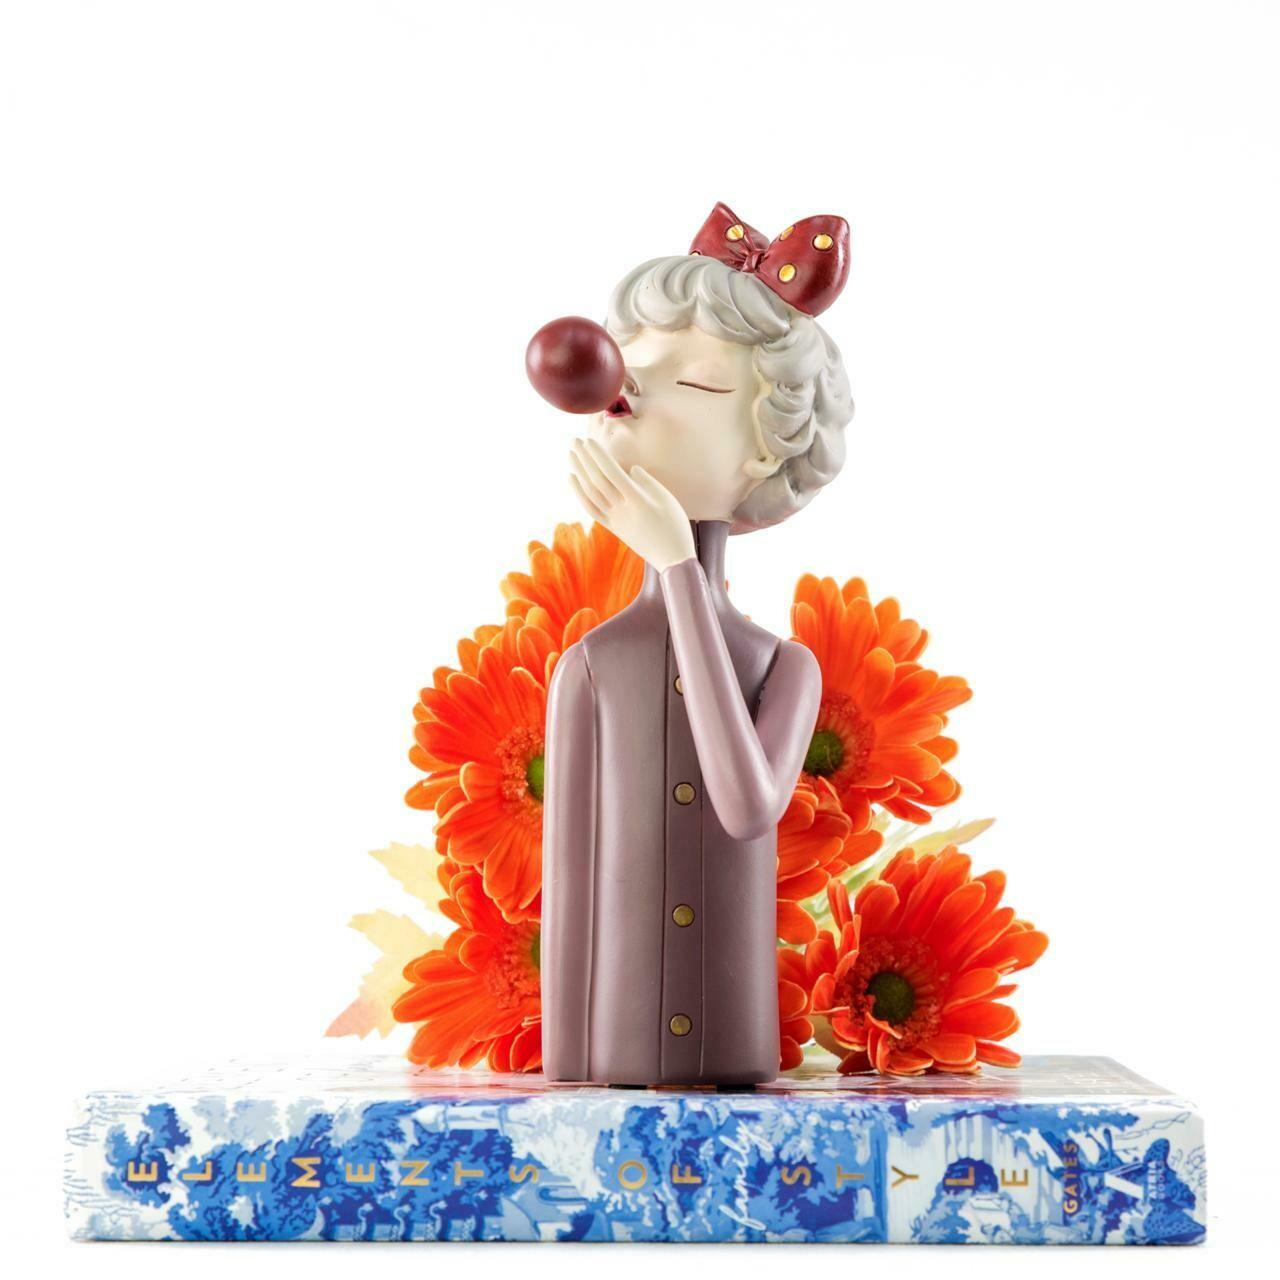 Purple Bubble Girl Sculpture - Cool Ornaments